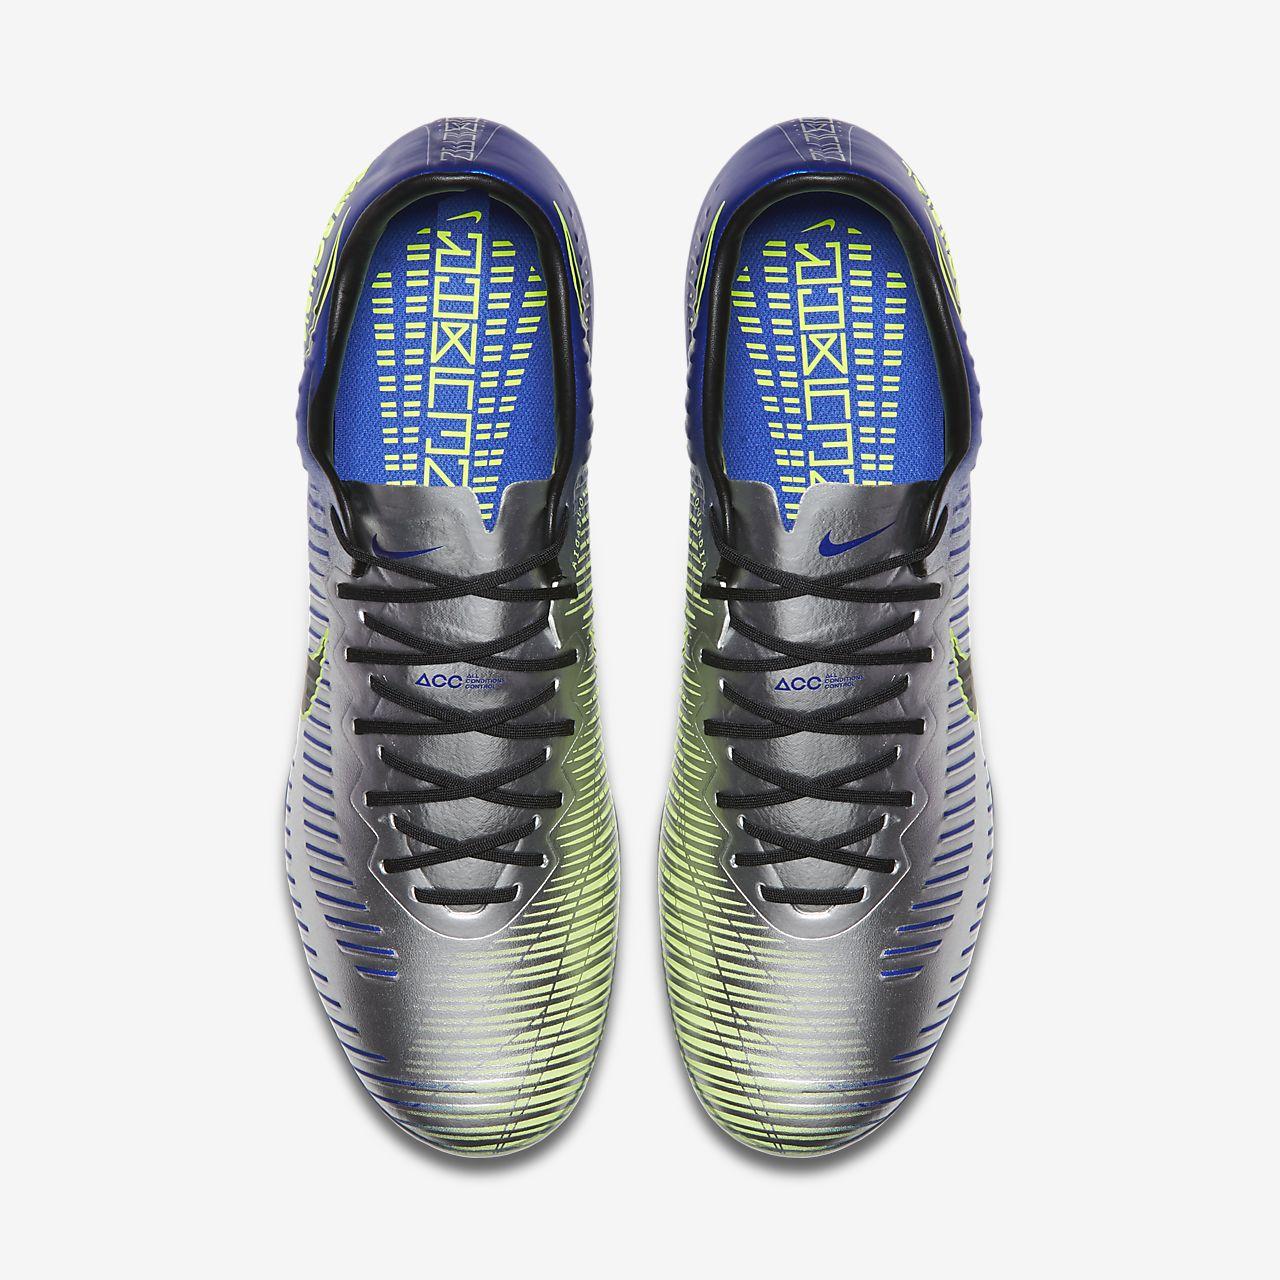 e1ed87bc848 ... chaussure de football à crampons pour terrain sec nike mercurial vapor  xi neymar